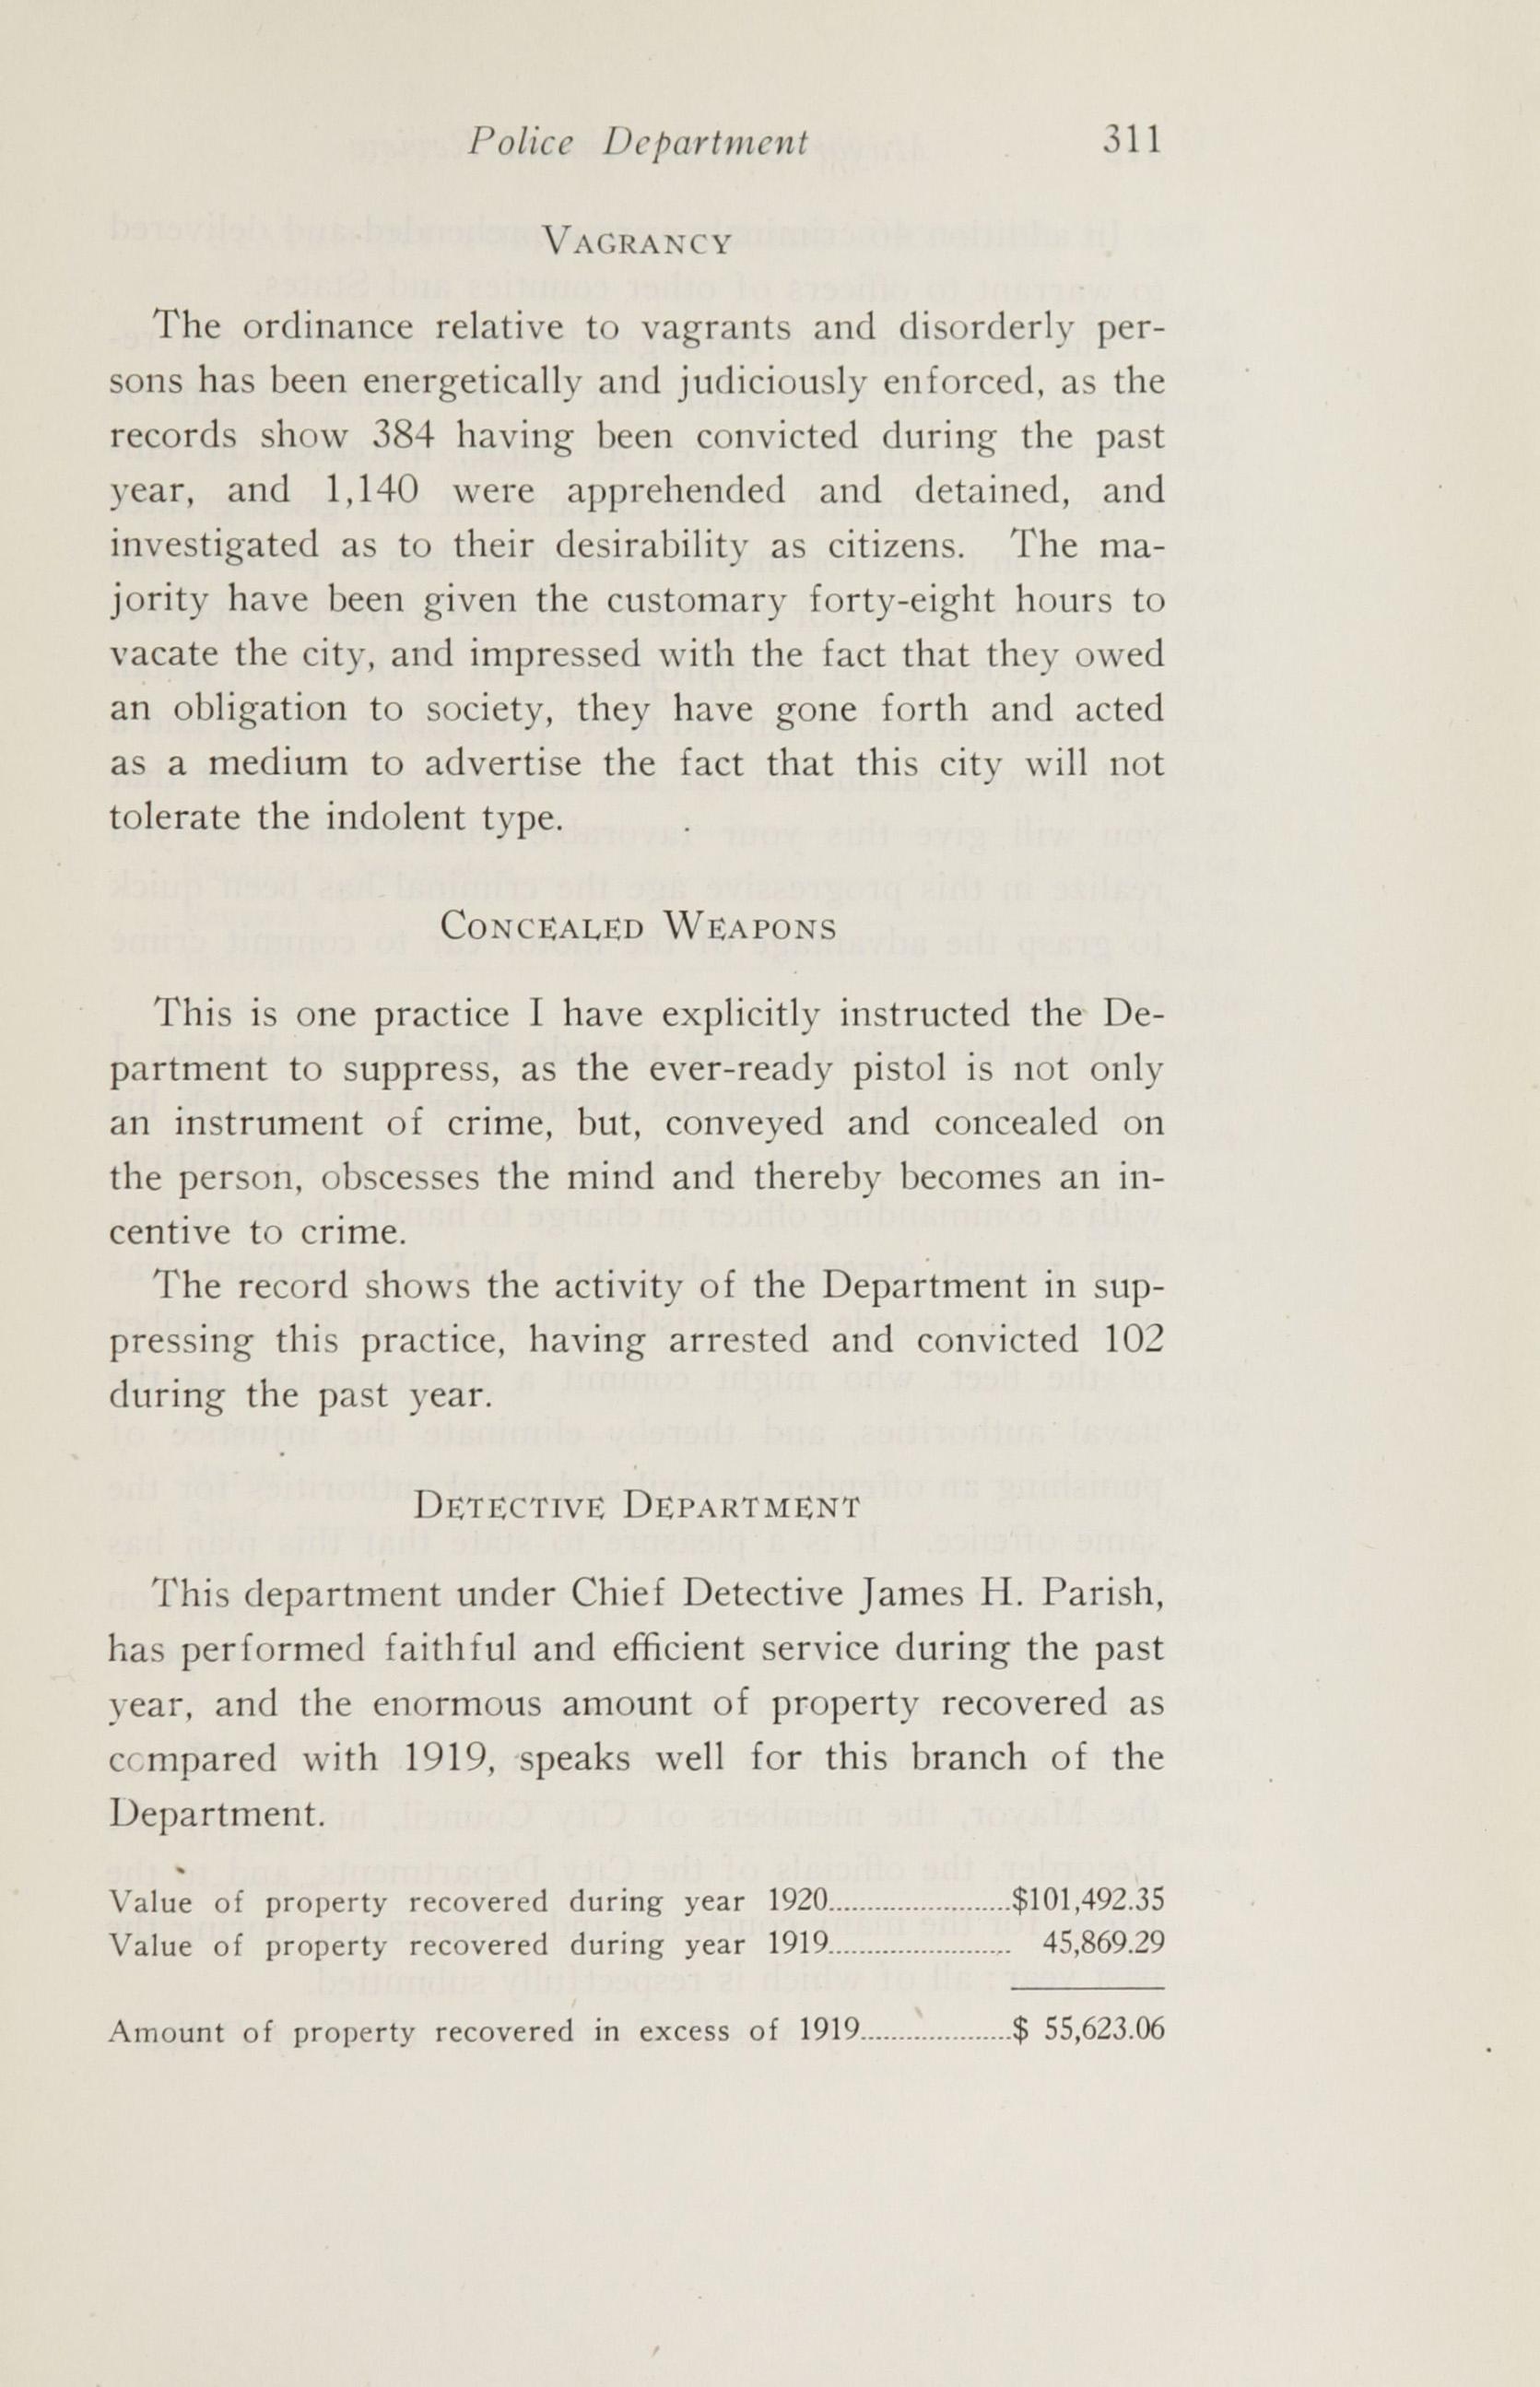 Charleston Yearbook, 1920, page 311